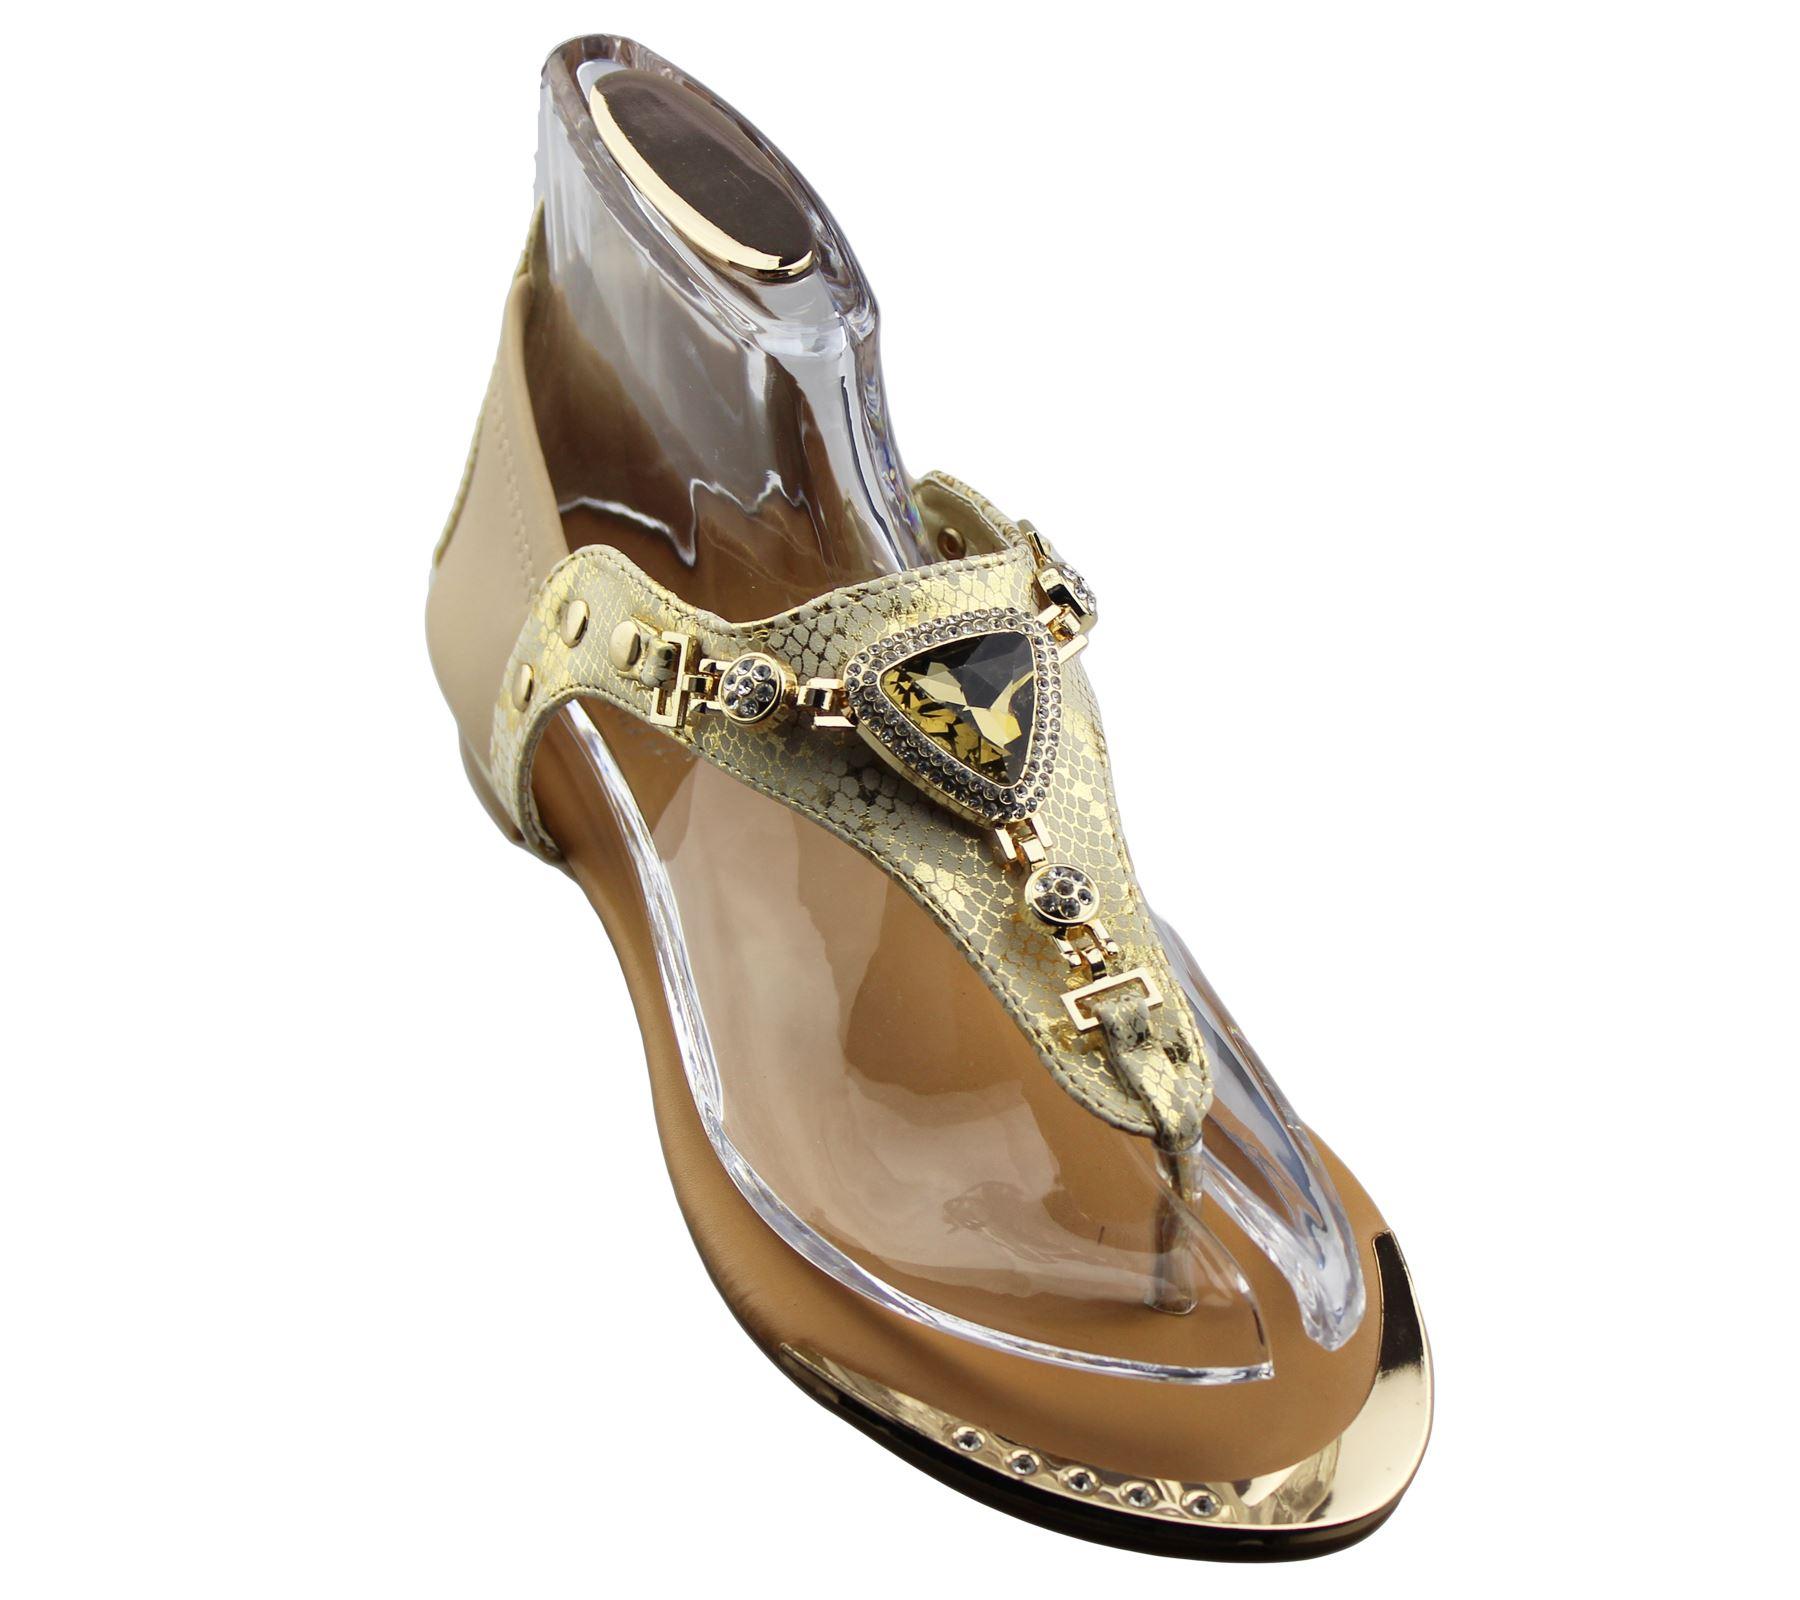 Womens-Flat-Summer-Sandals-Ladies-Diamante-Wedding-Toe-Post-Casual-Slipper thumbnail 16